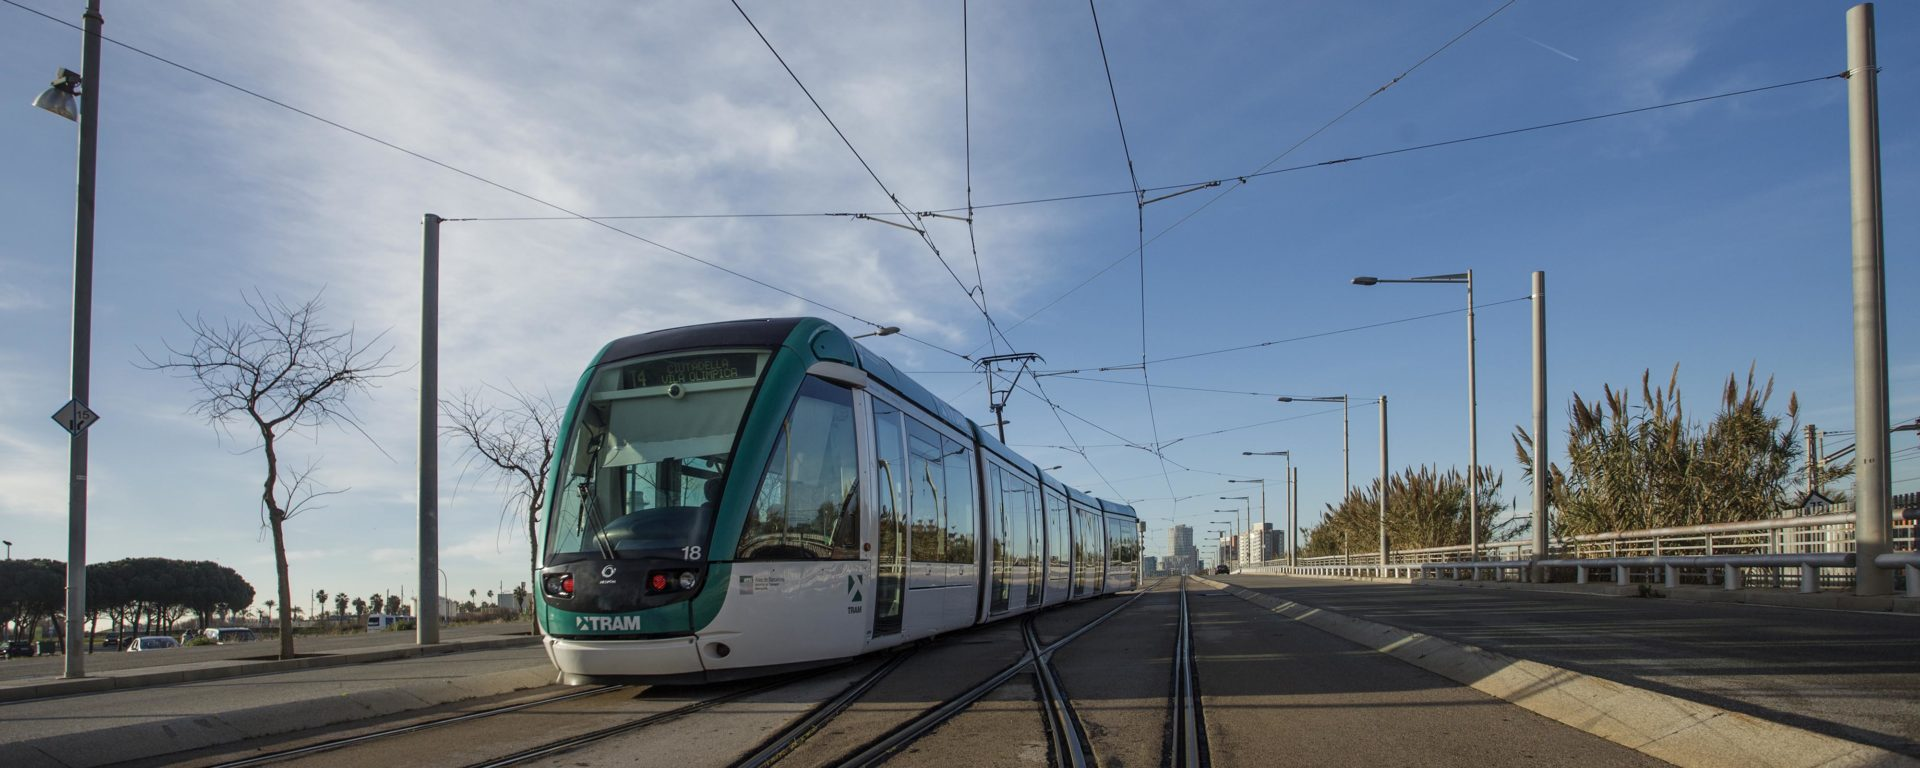 tram_barcelona_mg_7398-copy